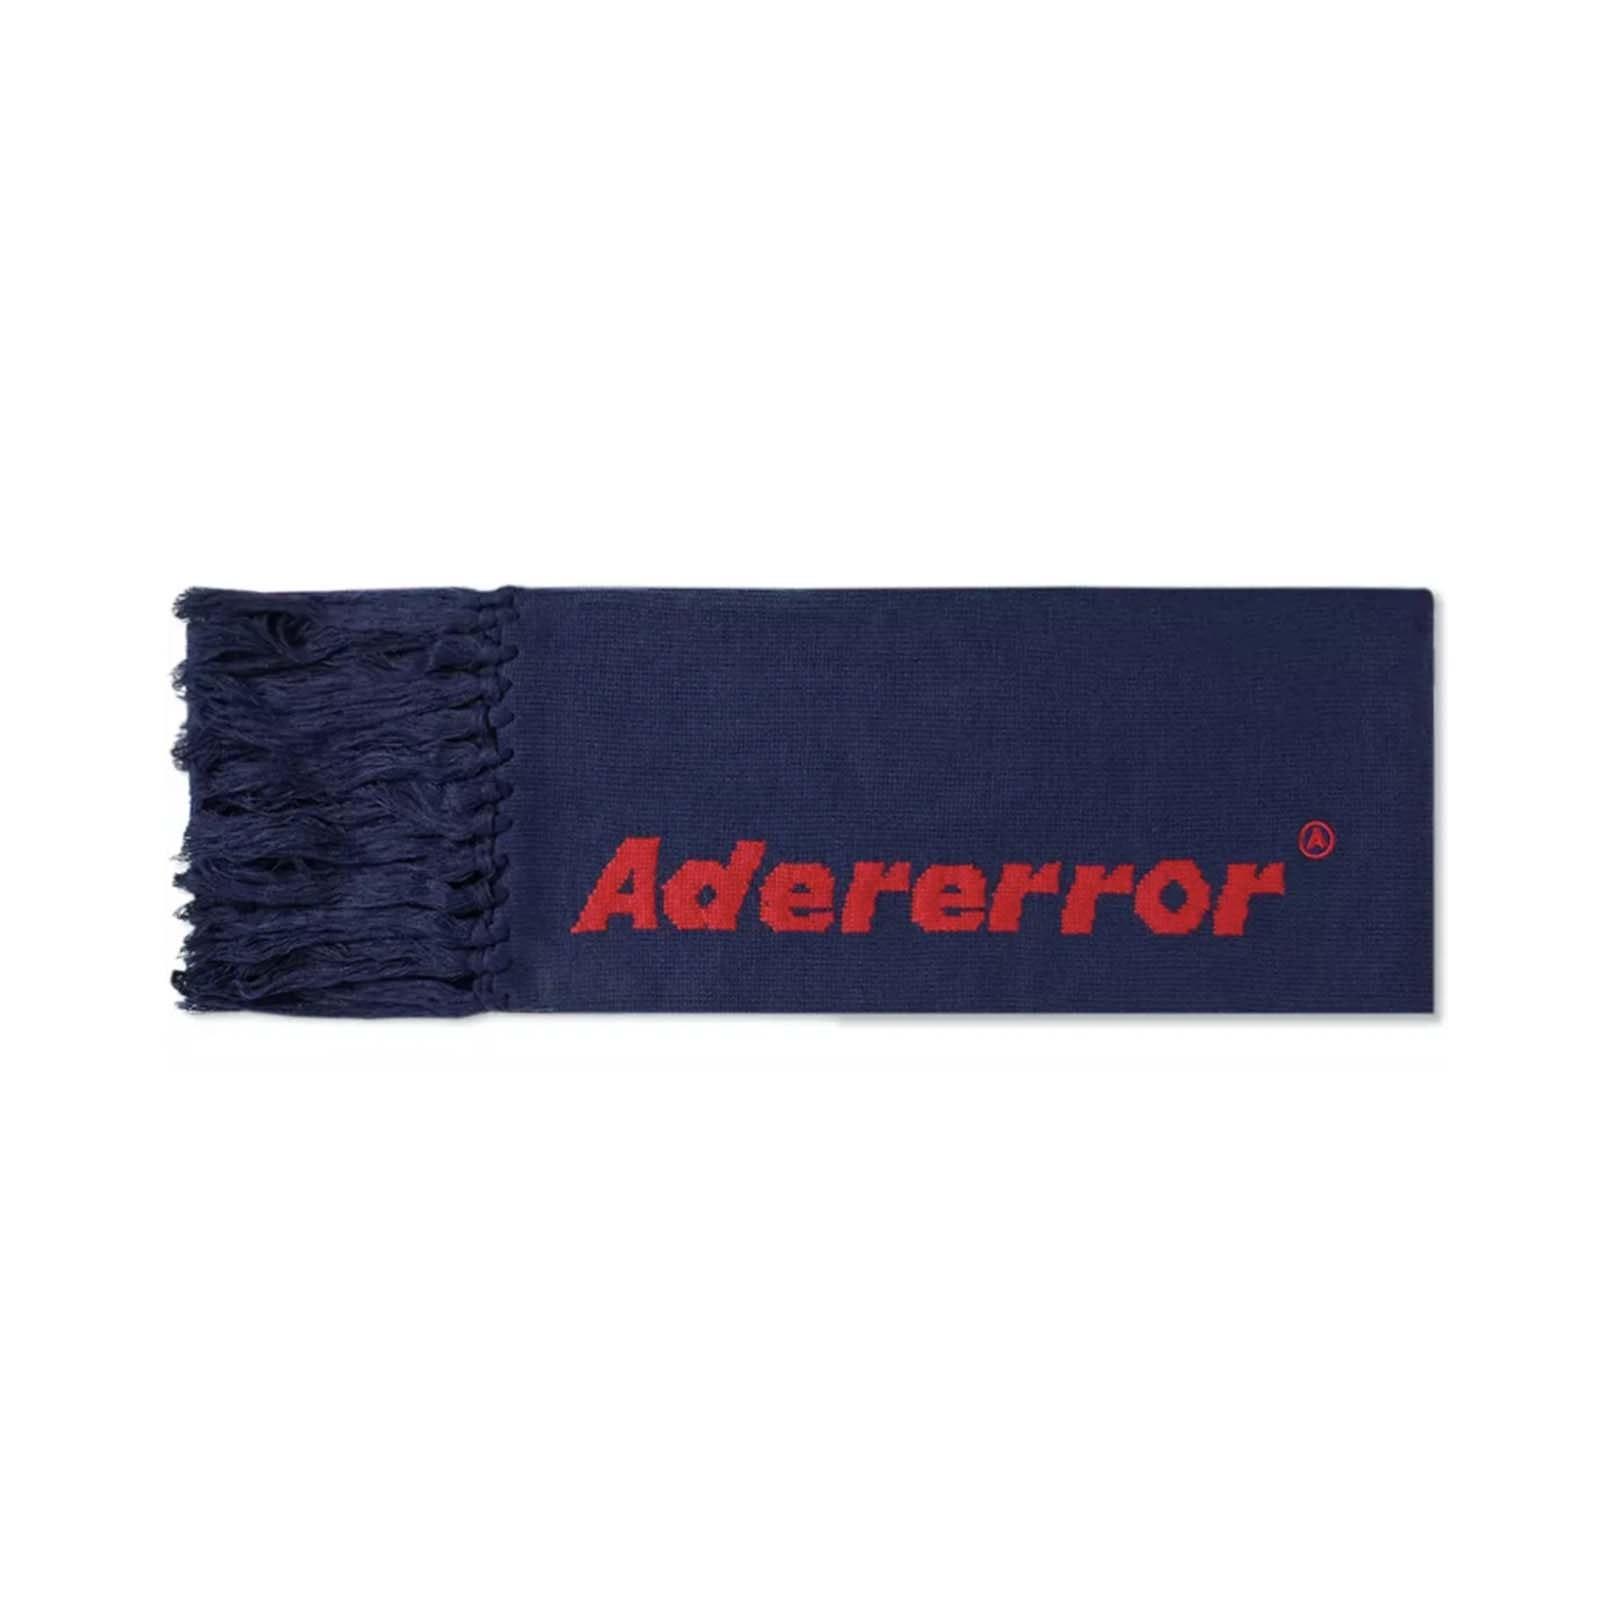 scarf%231 instoryimage